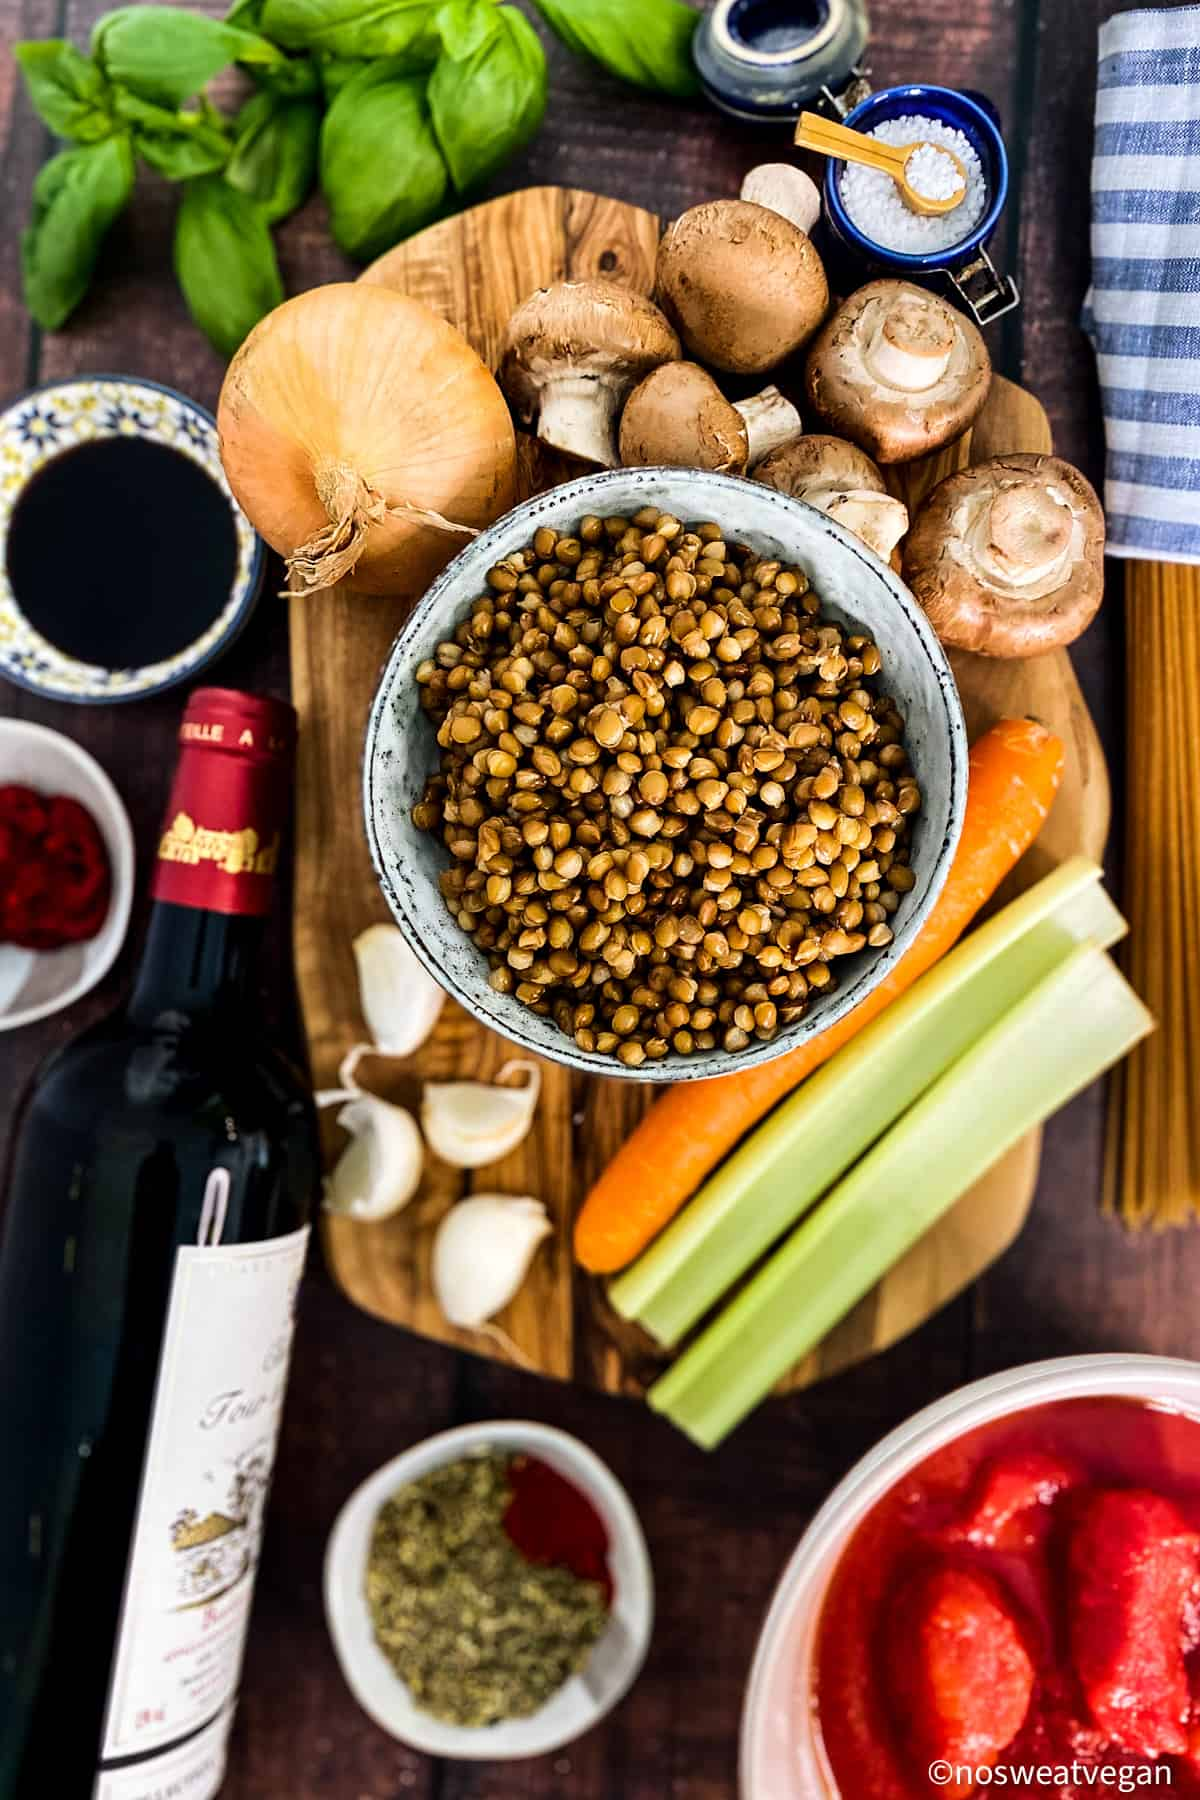 Ingredients for Vegan Bolognese with Lentils.